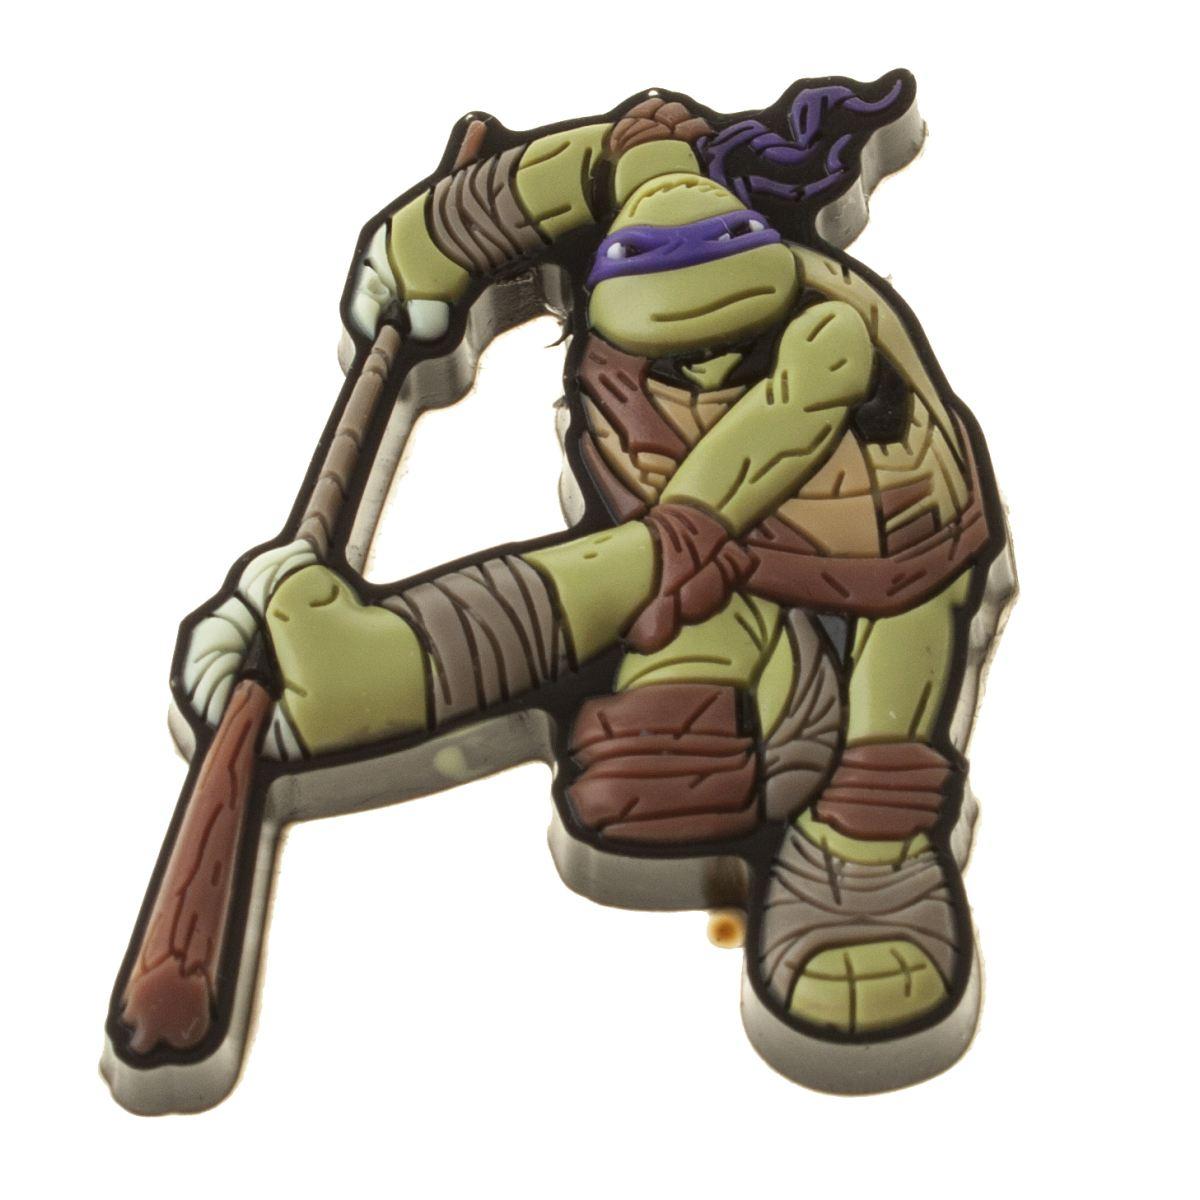 jibbitz Jibbitz Dark Green Ninja Turtles Donatello Shoe Accessories